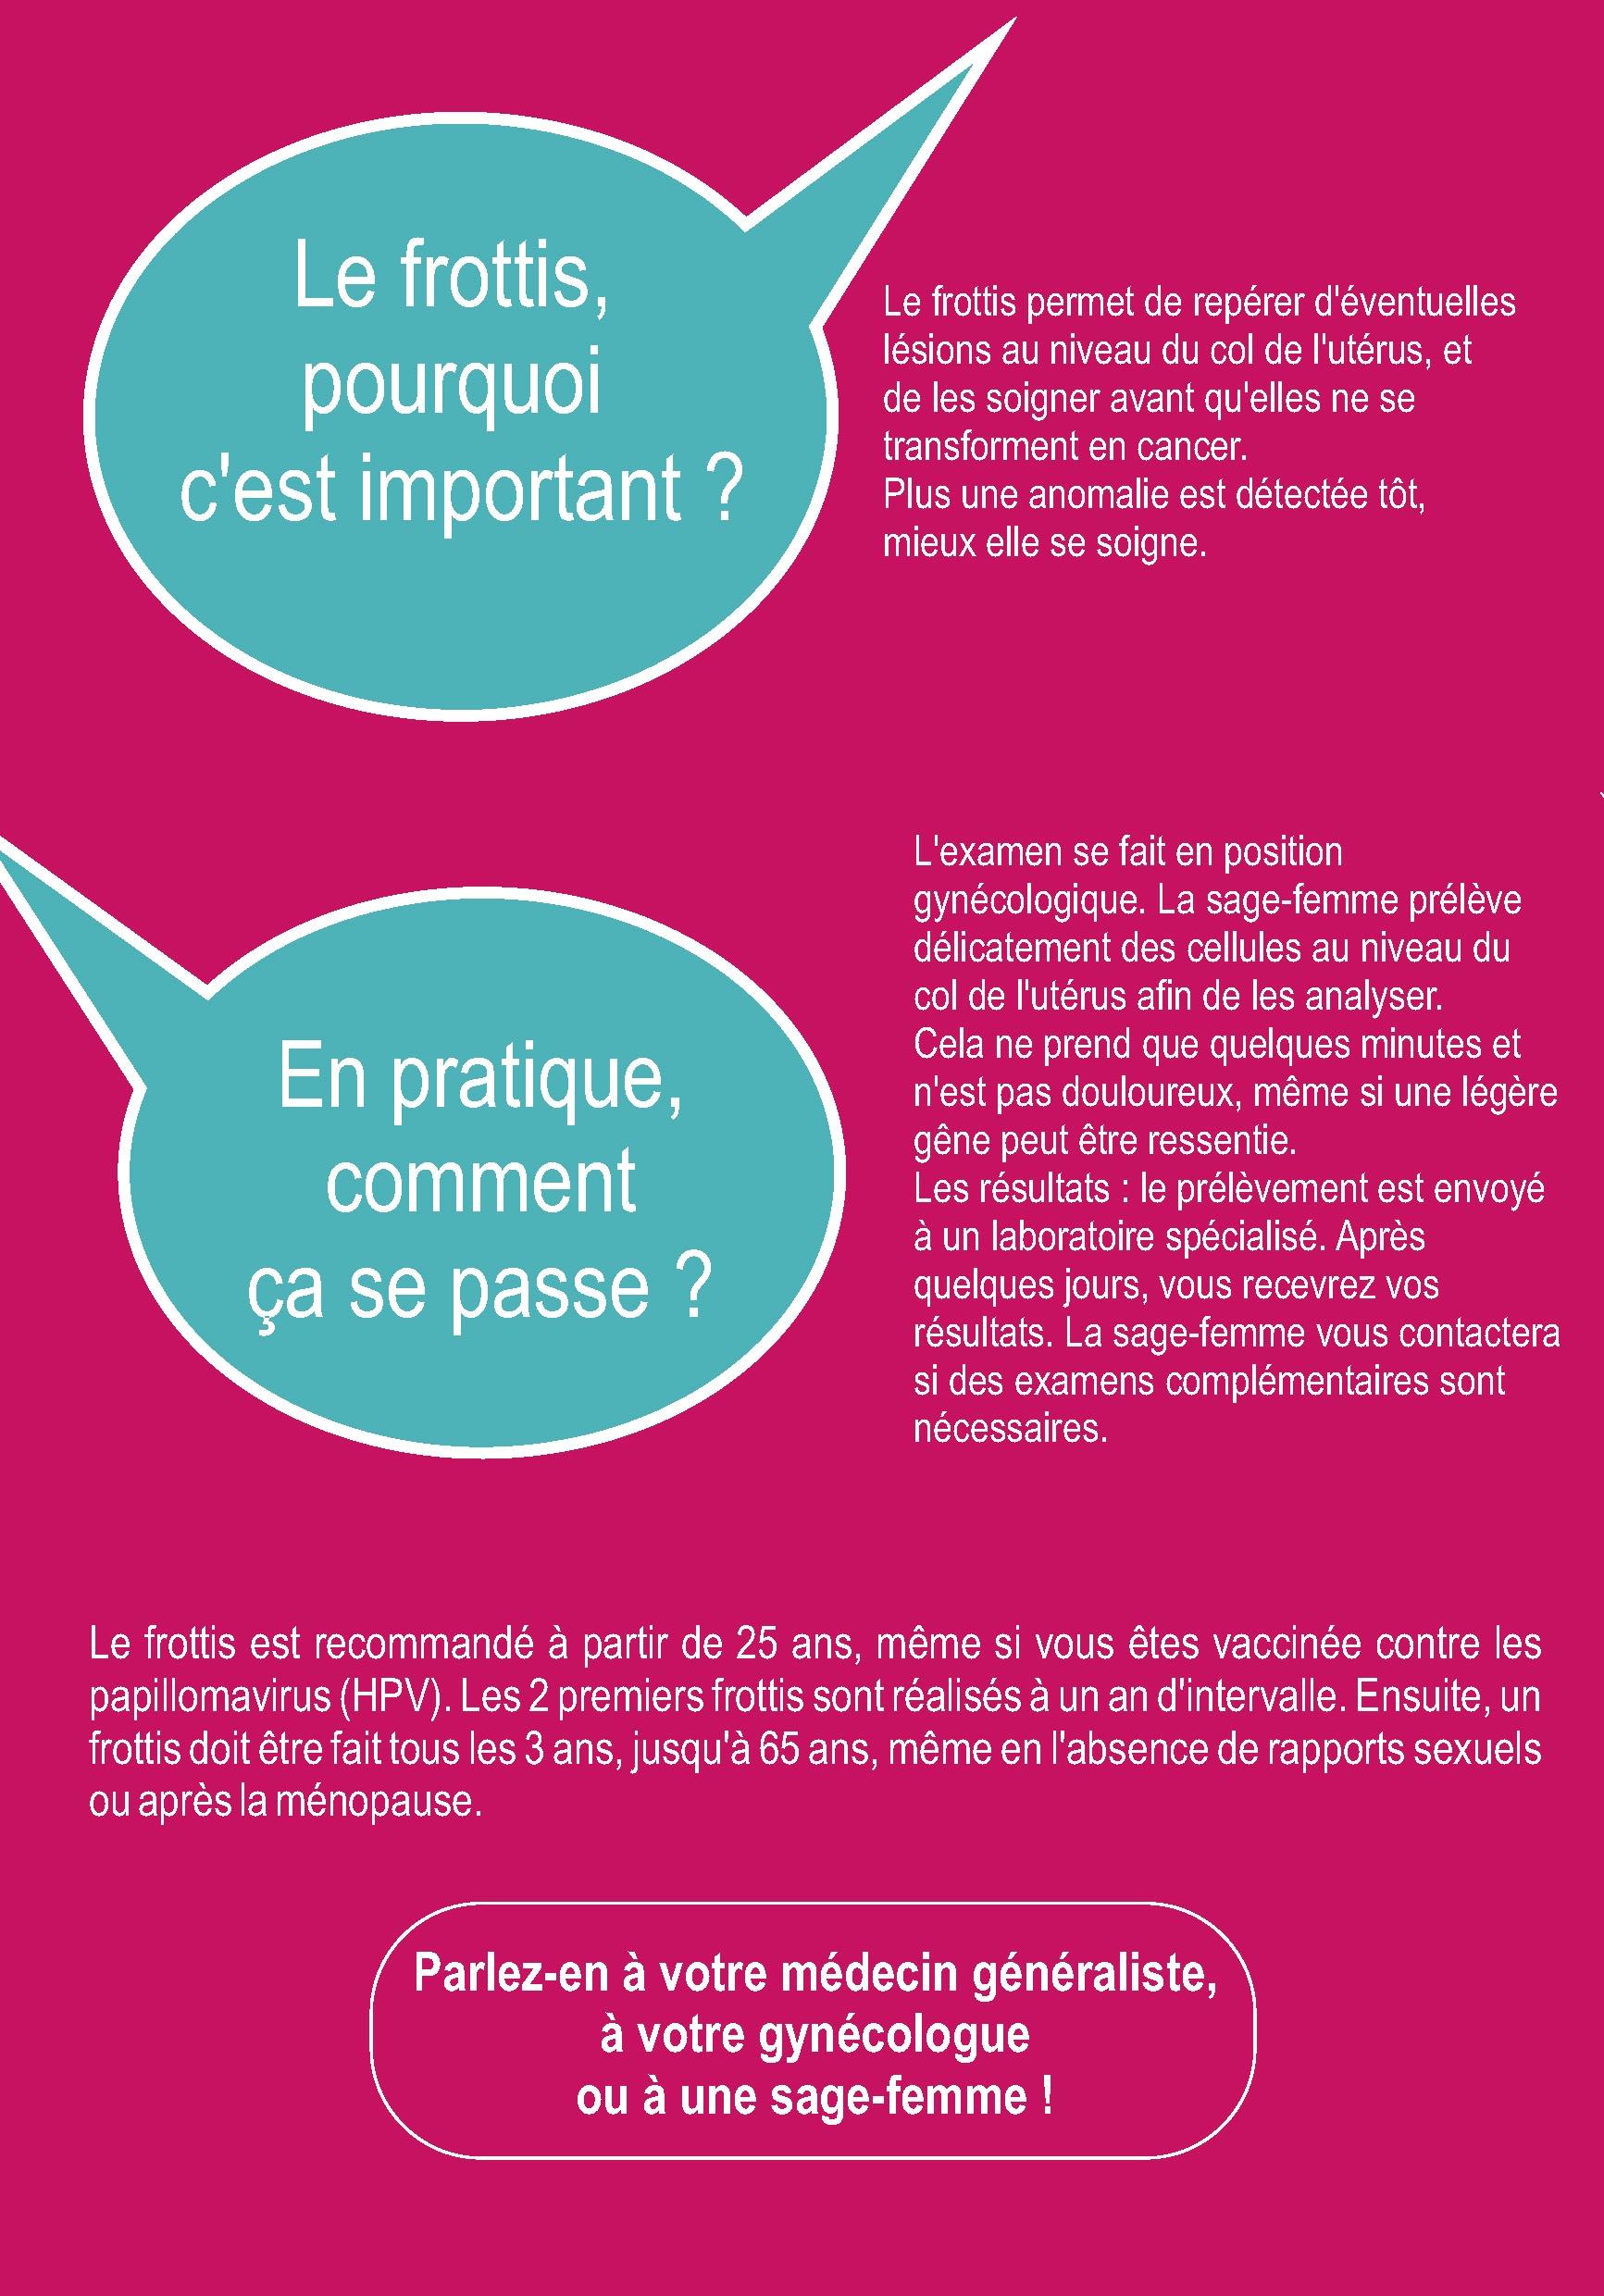 Flyer_depistage_cancer_uterus_Fleury_Page_2.jpg